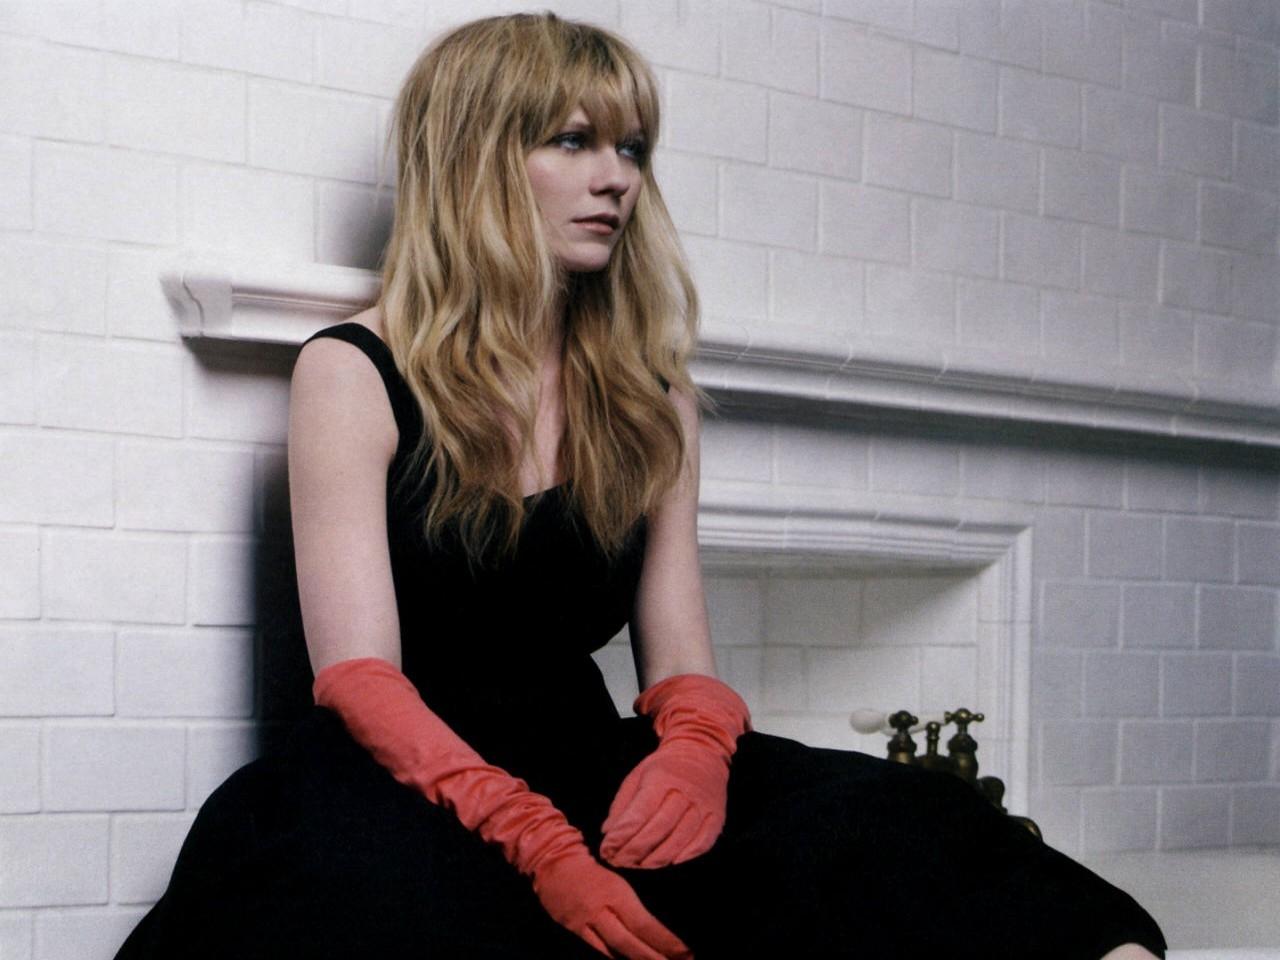 Wallpaper - lunghi guanti rossi e outfit nero per  Kirsten Dunst